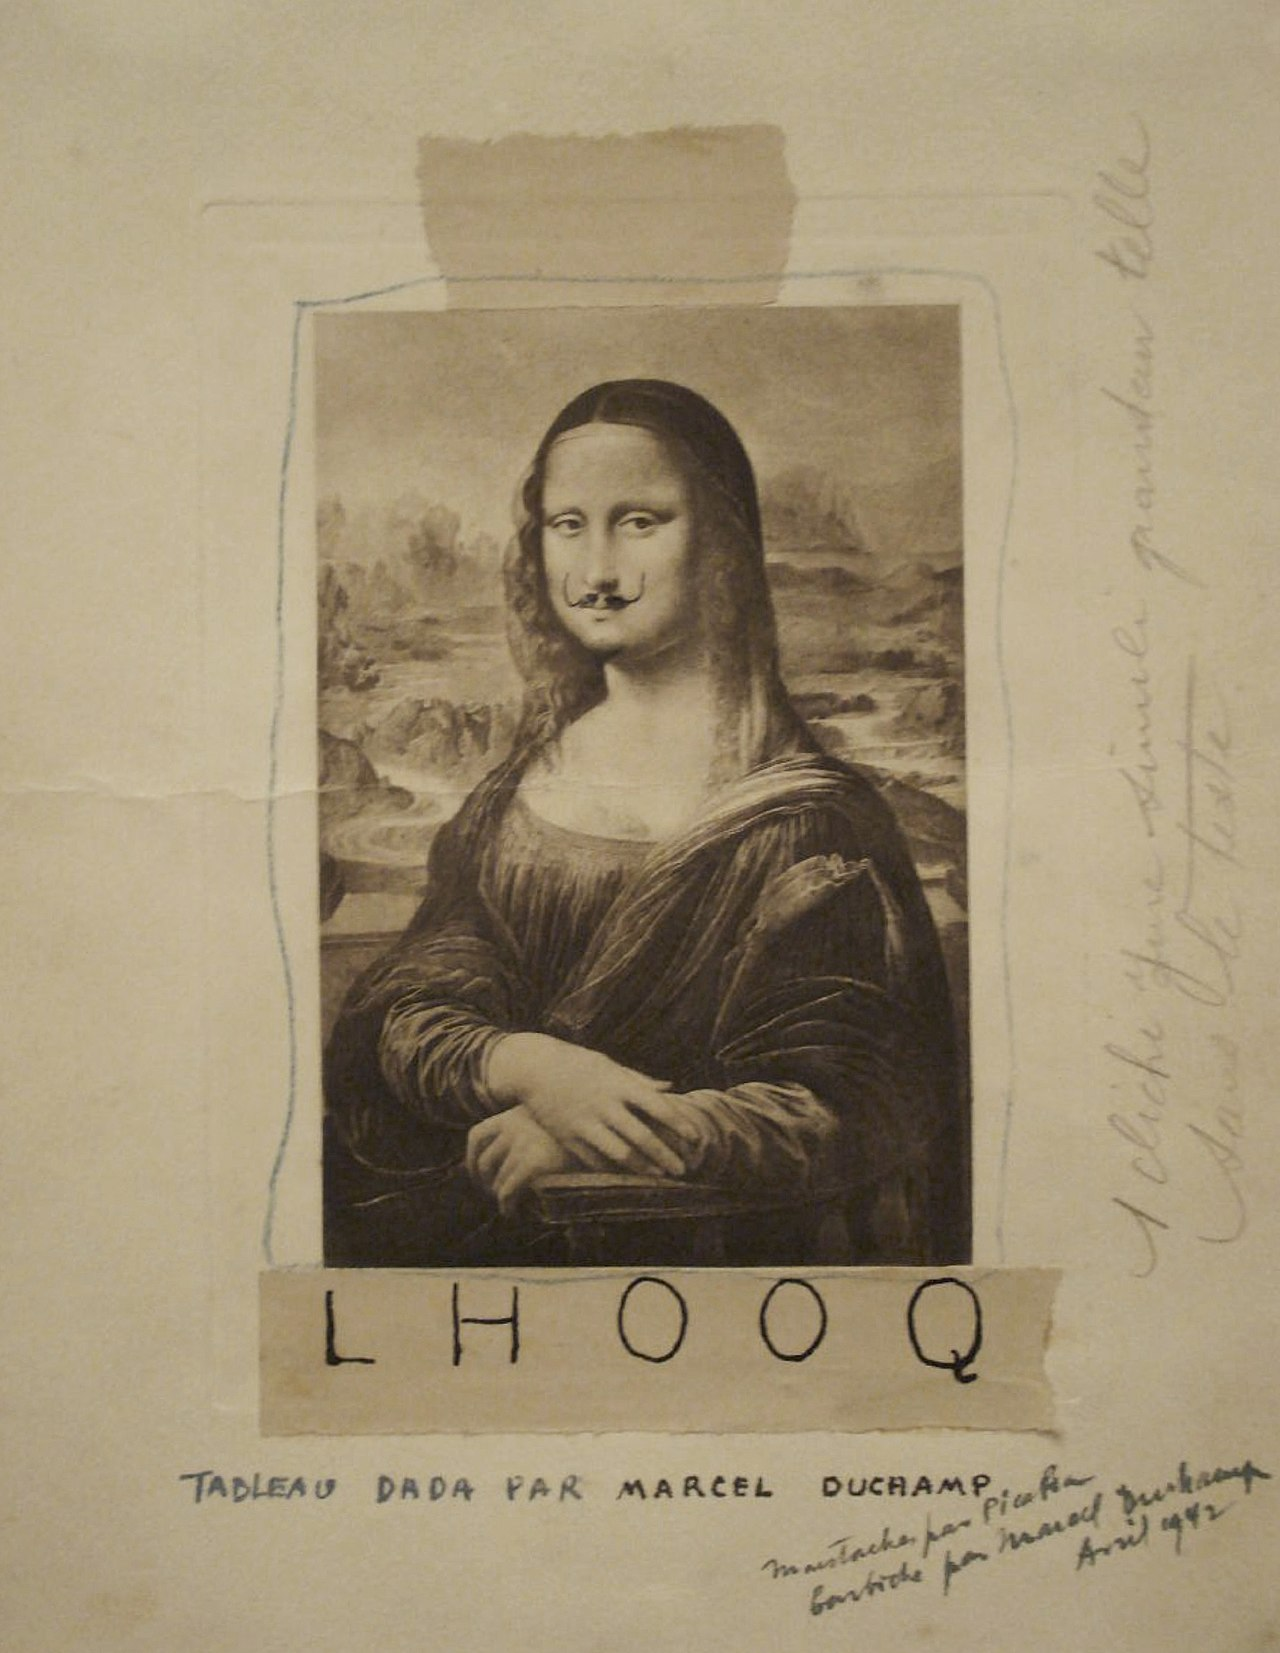 L.H.O.O.Q., Marcel Duchamp, 1919